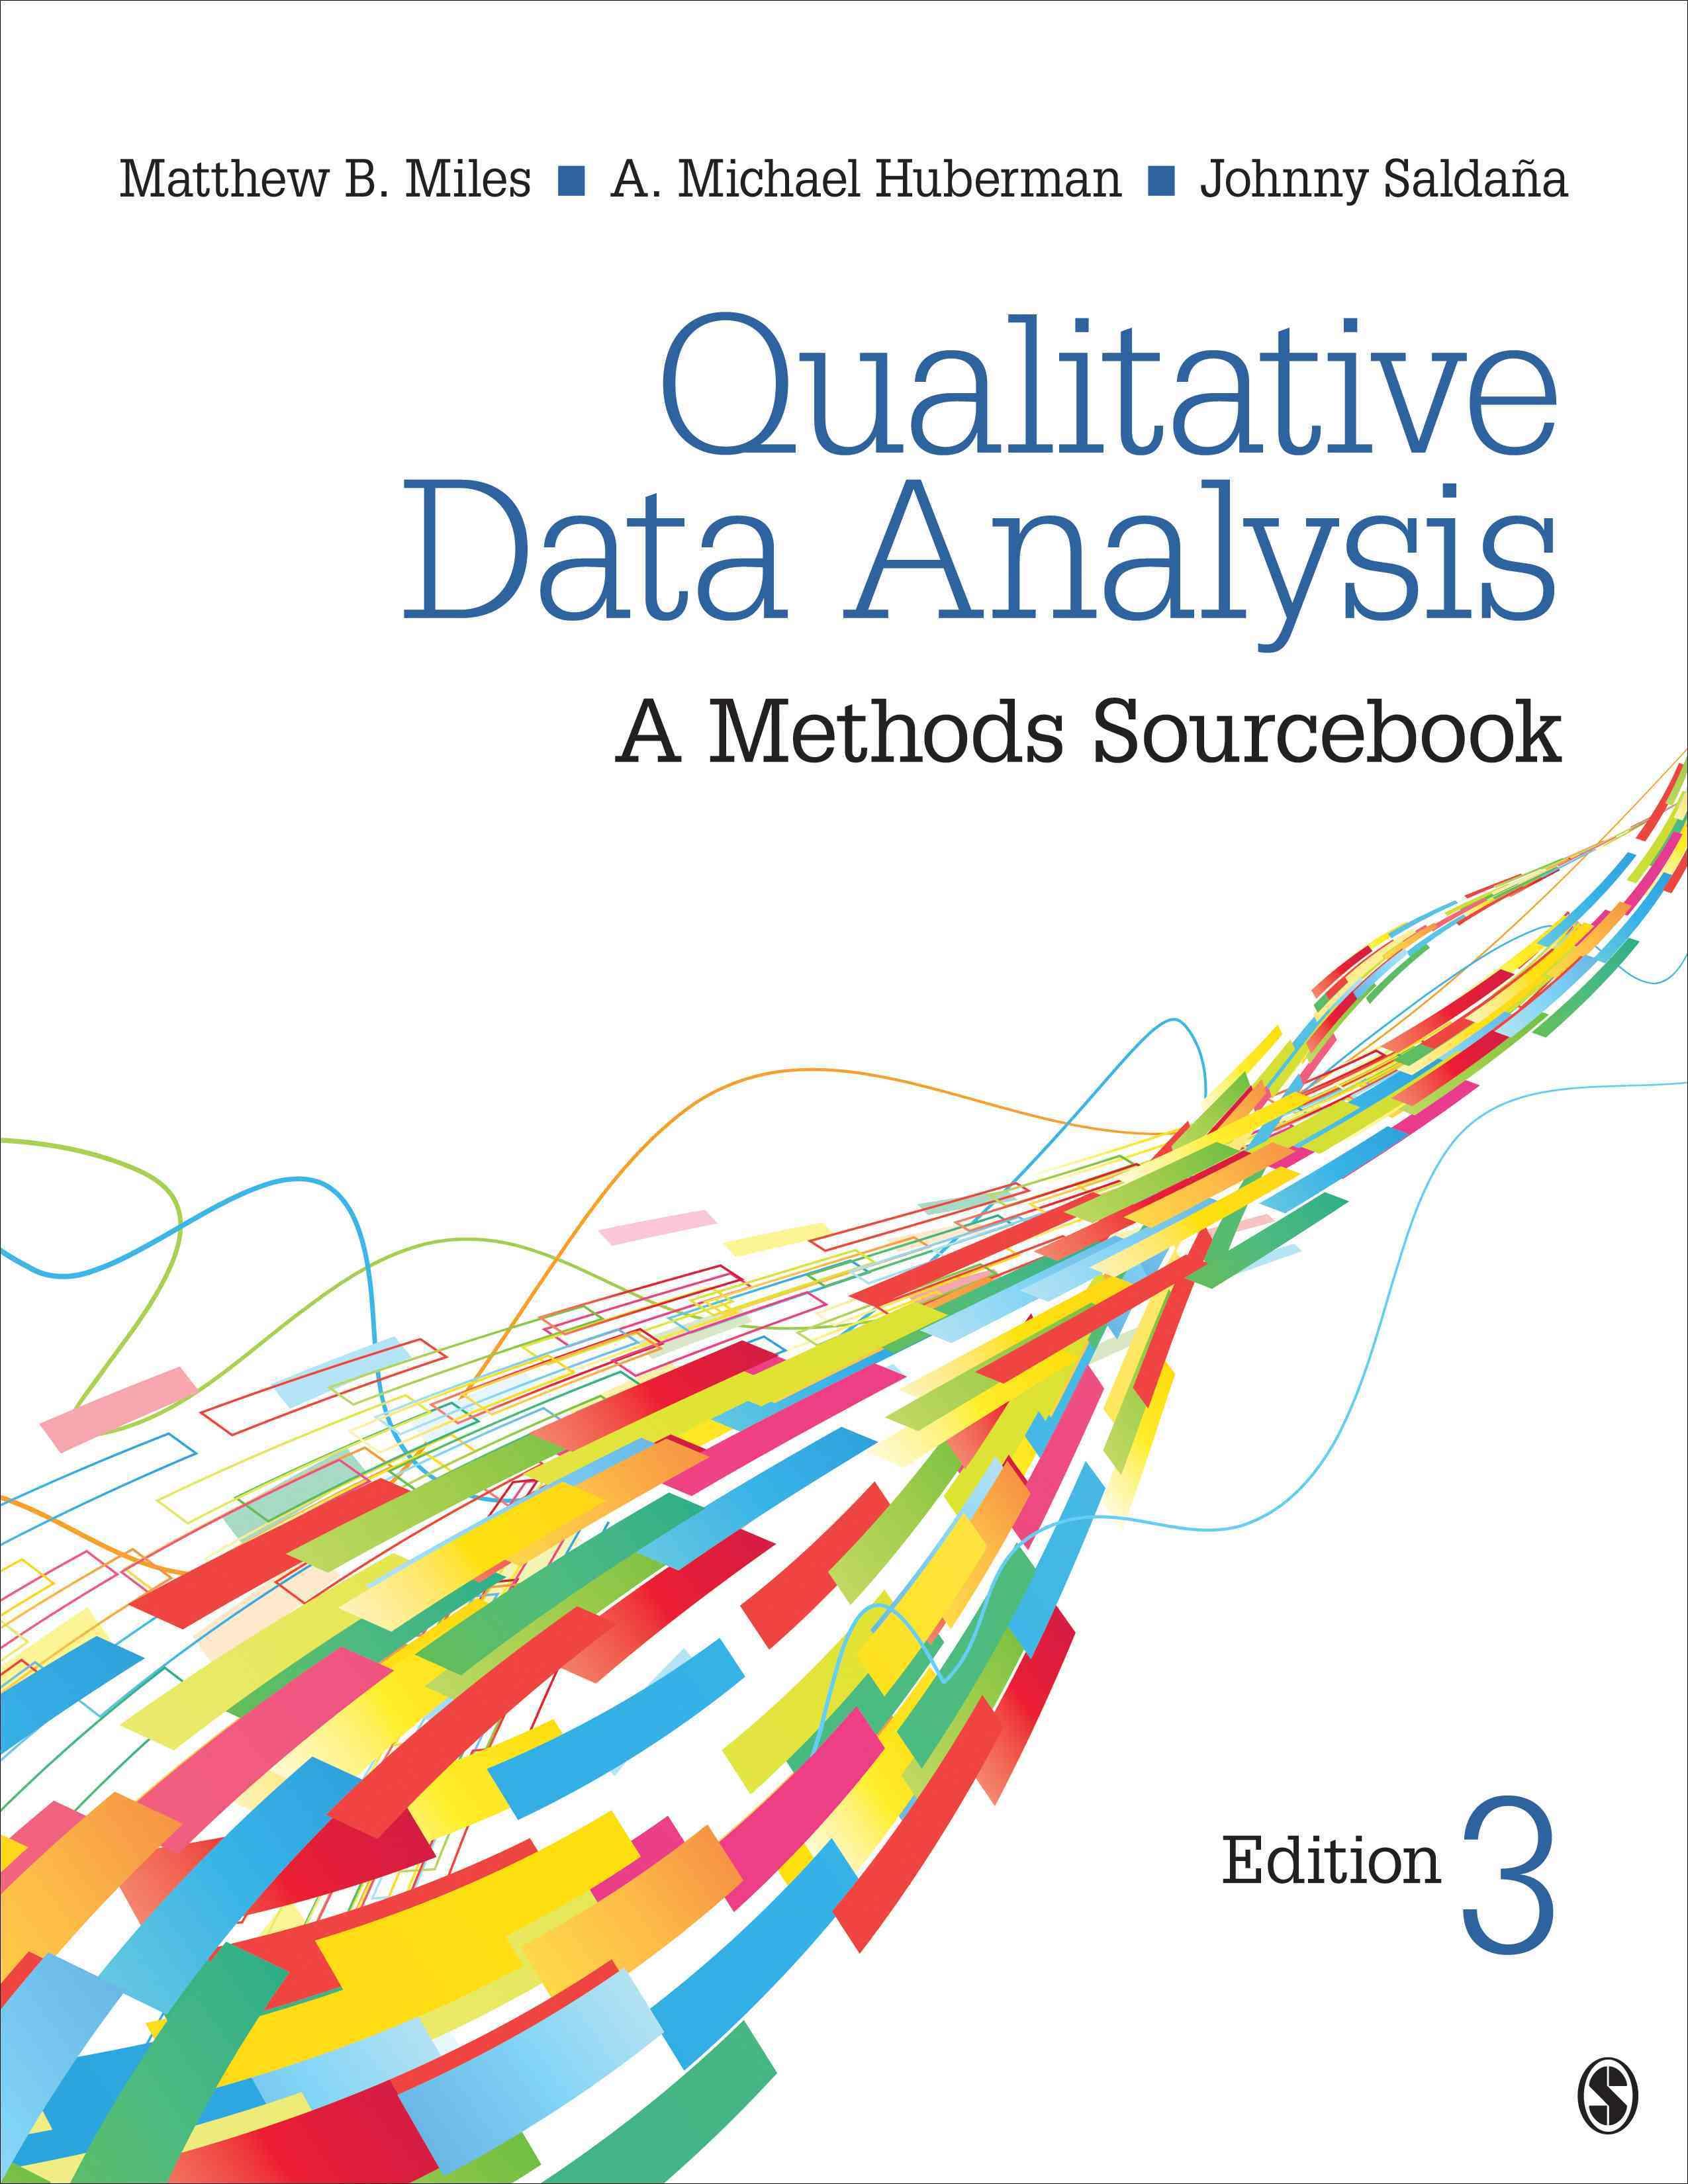 Qualitative Data Analysis: A Methods Sourcebook (Paperback)